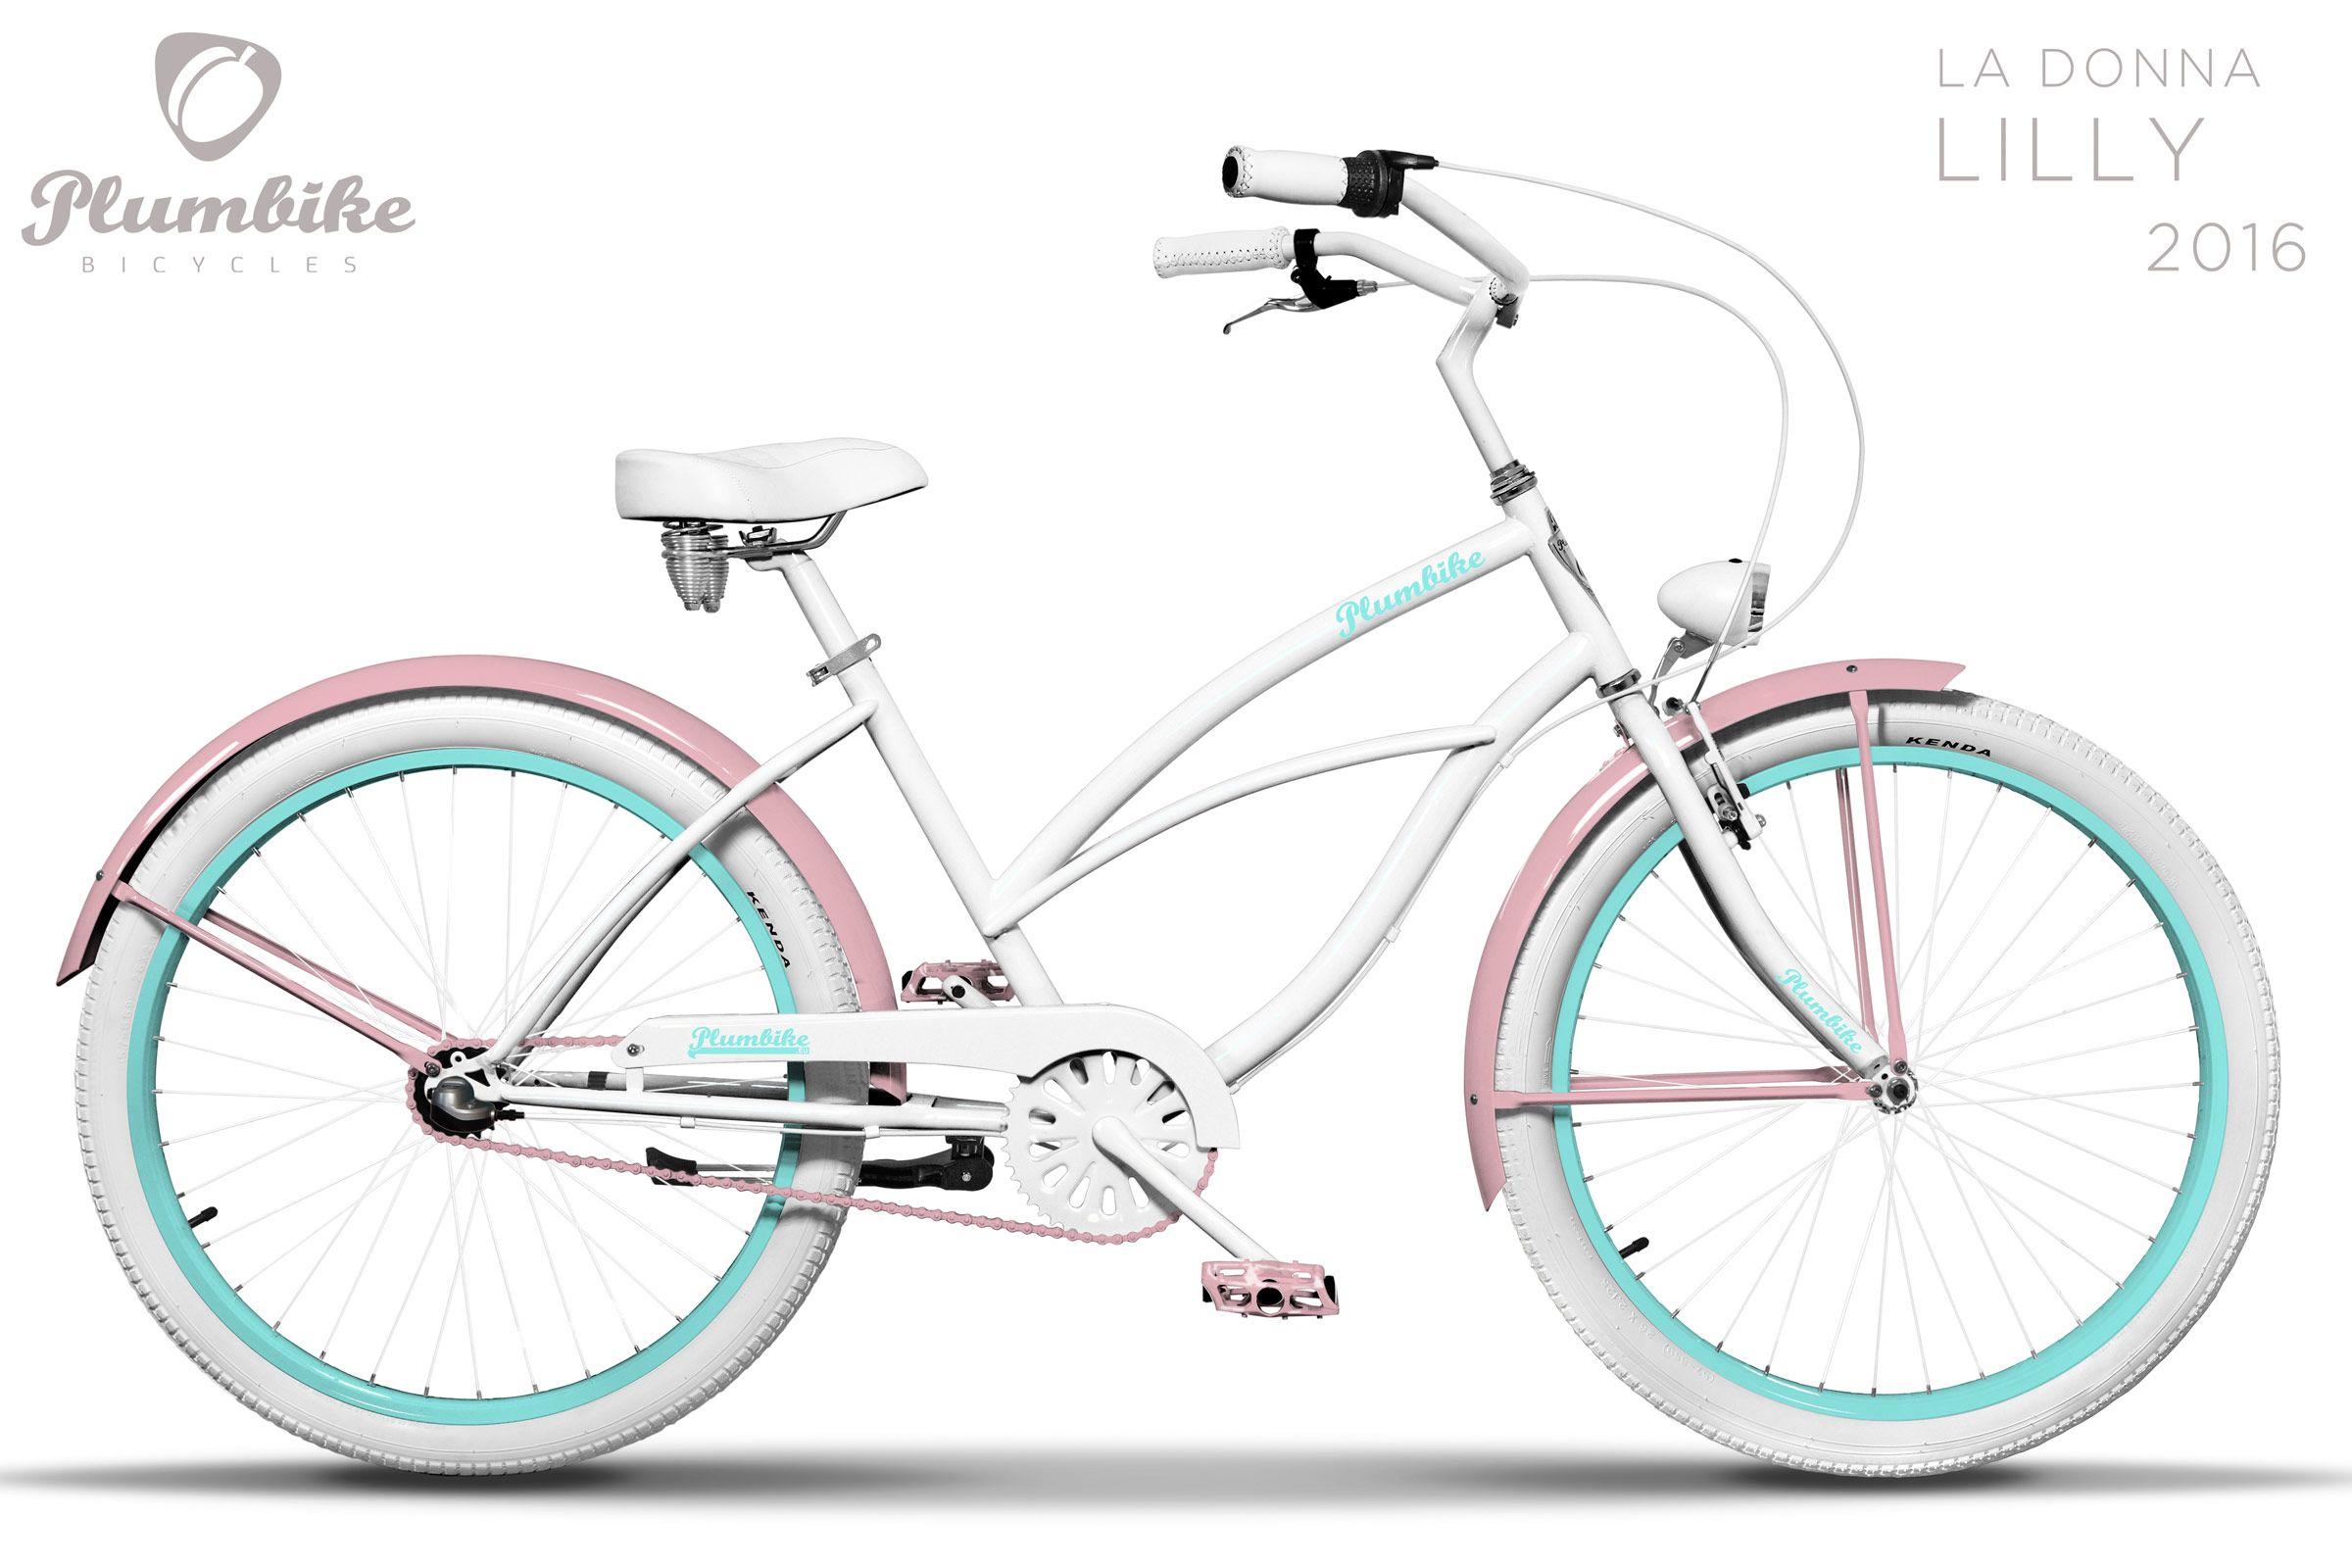 95d867236 Bici para mujer retro LILY   bici   Bicicleta mujer, Bicicleta ...